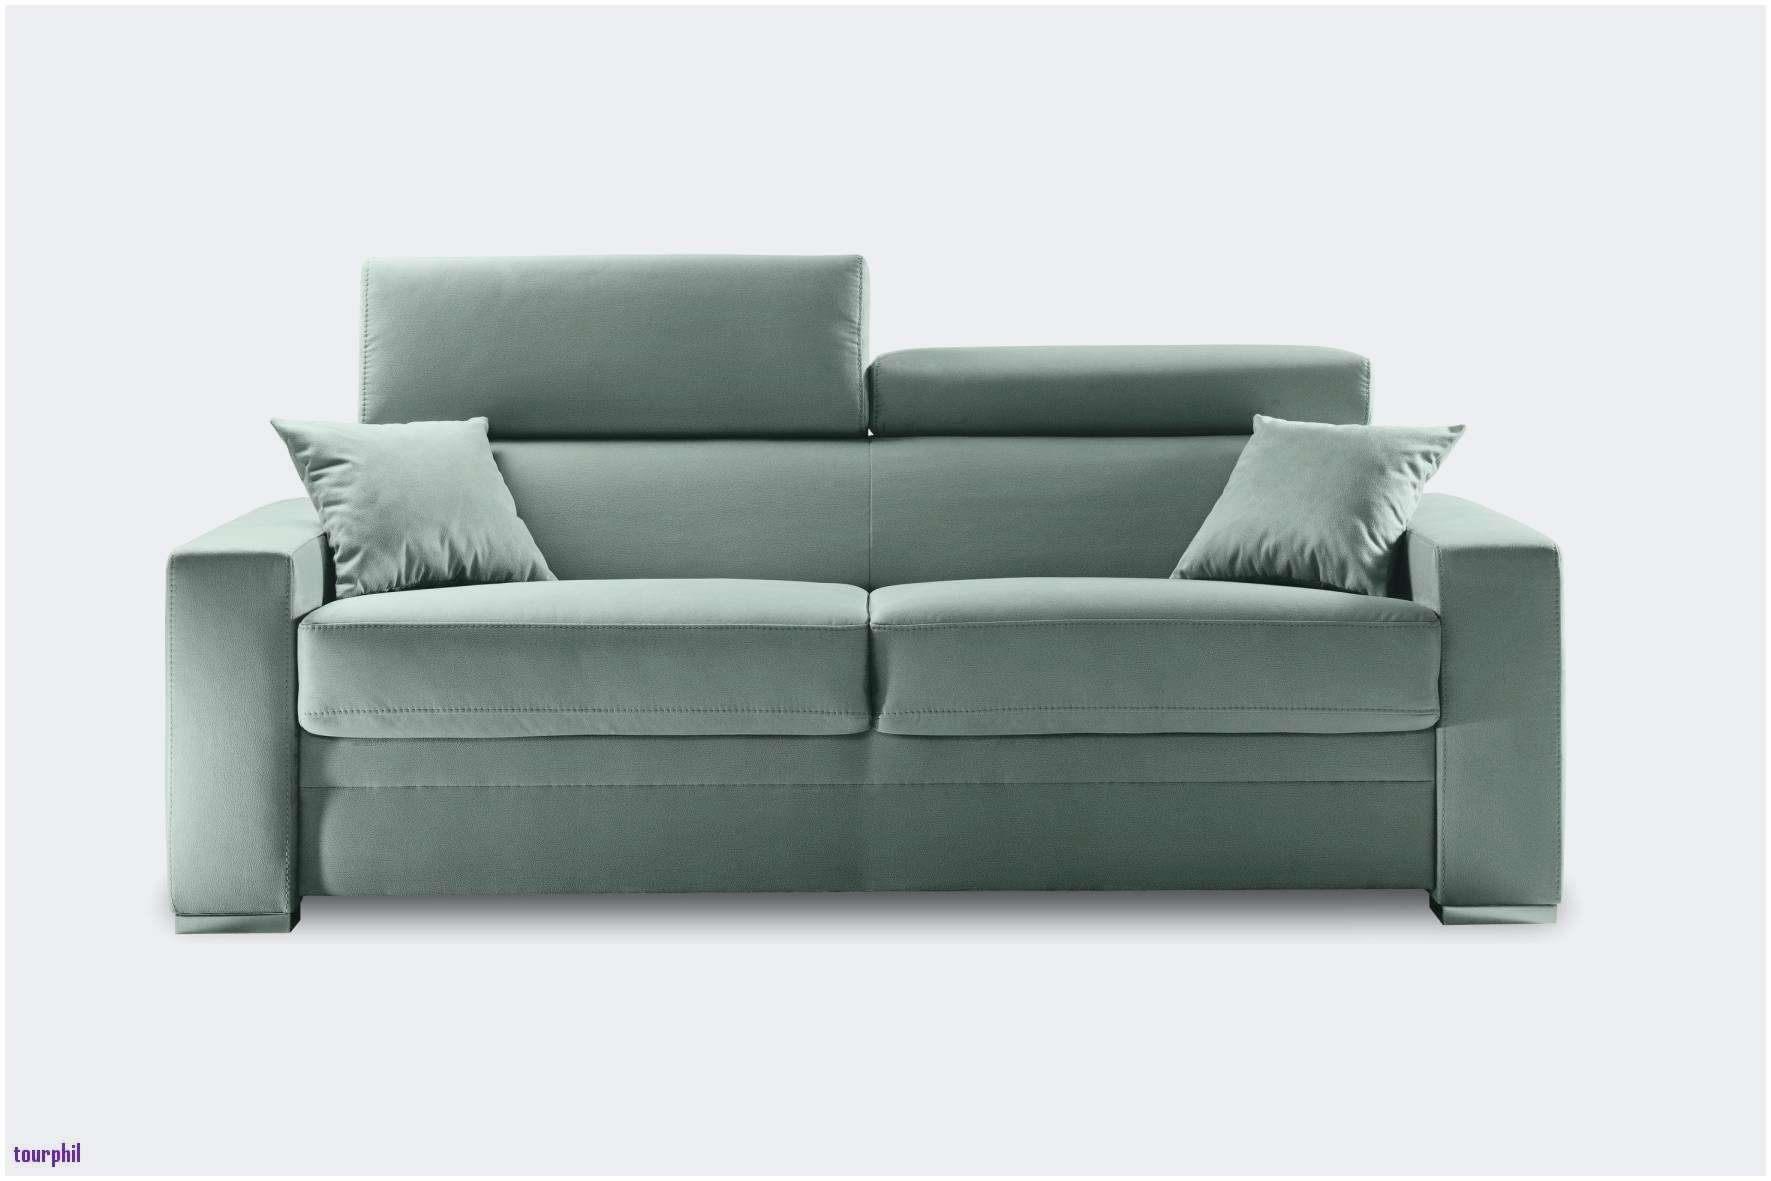 Impressionnant Canapé Ikea Convertible Angle Beau S Canap